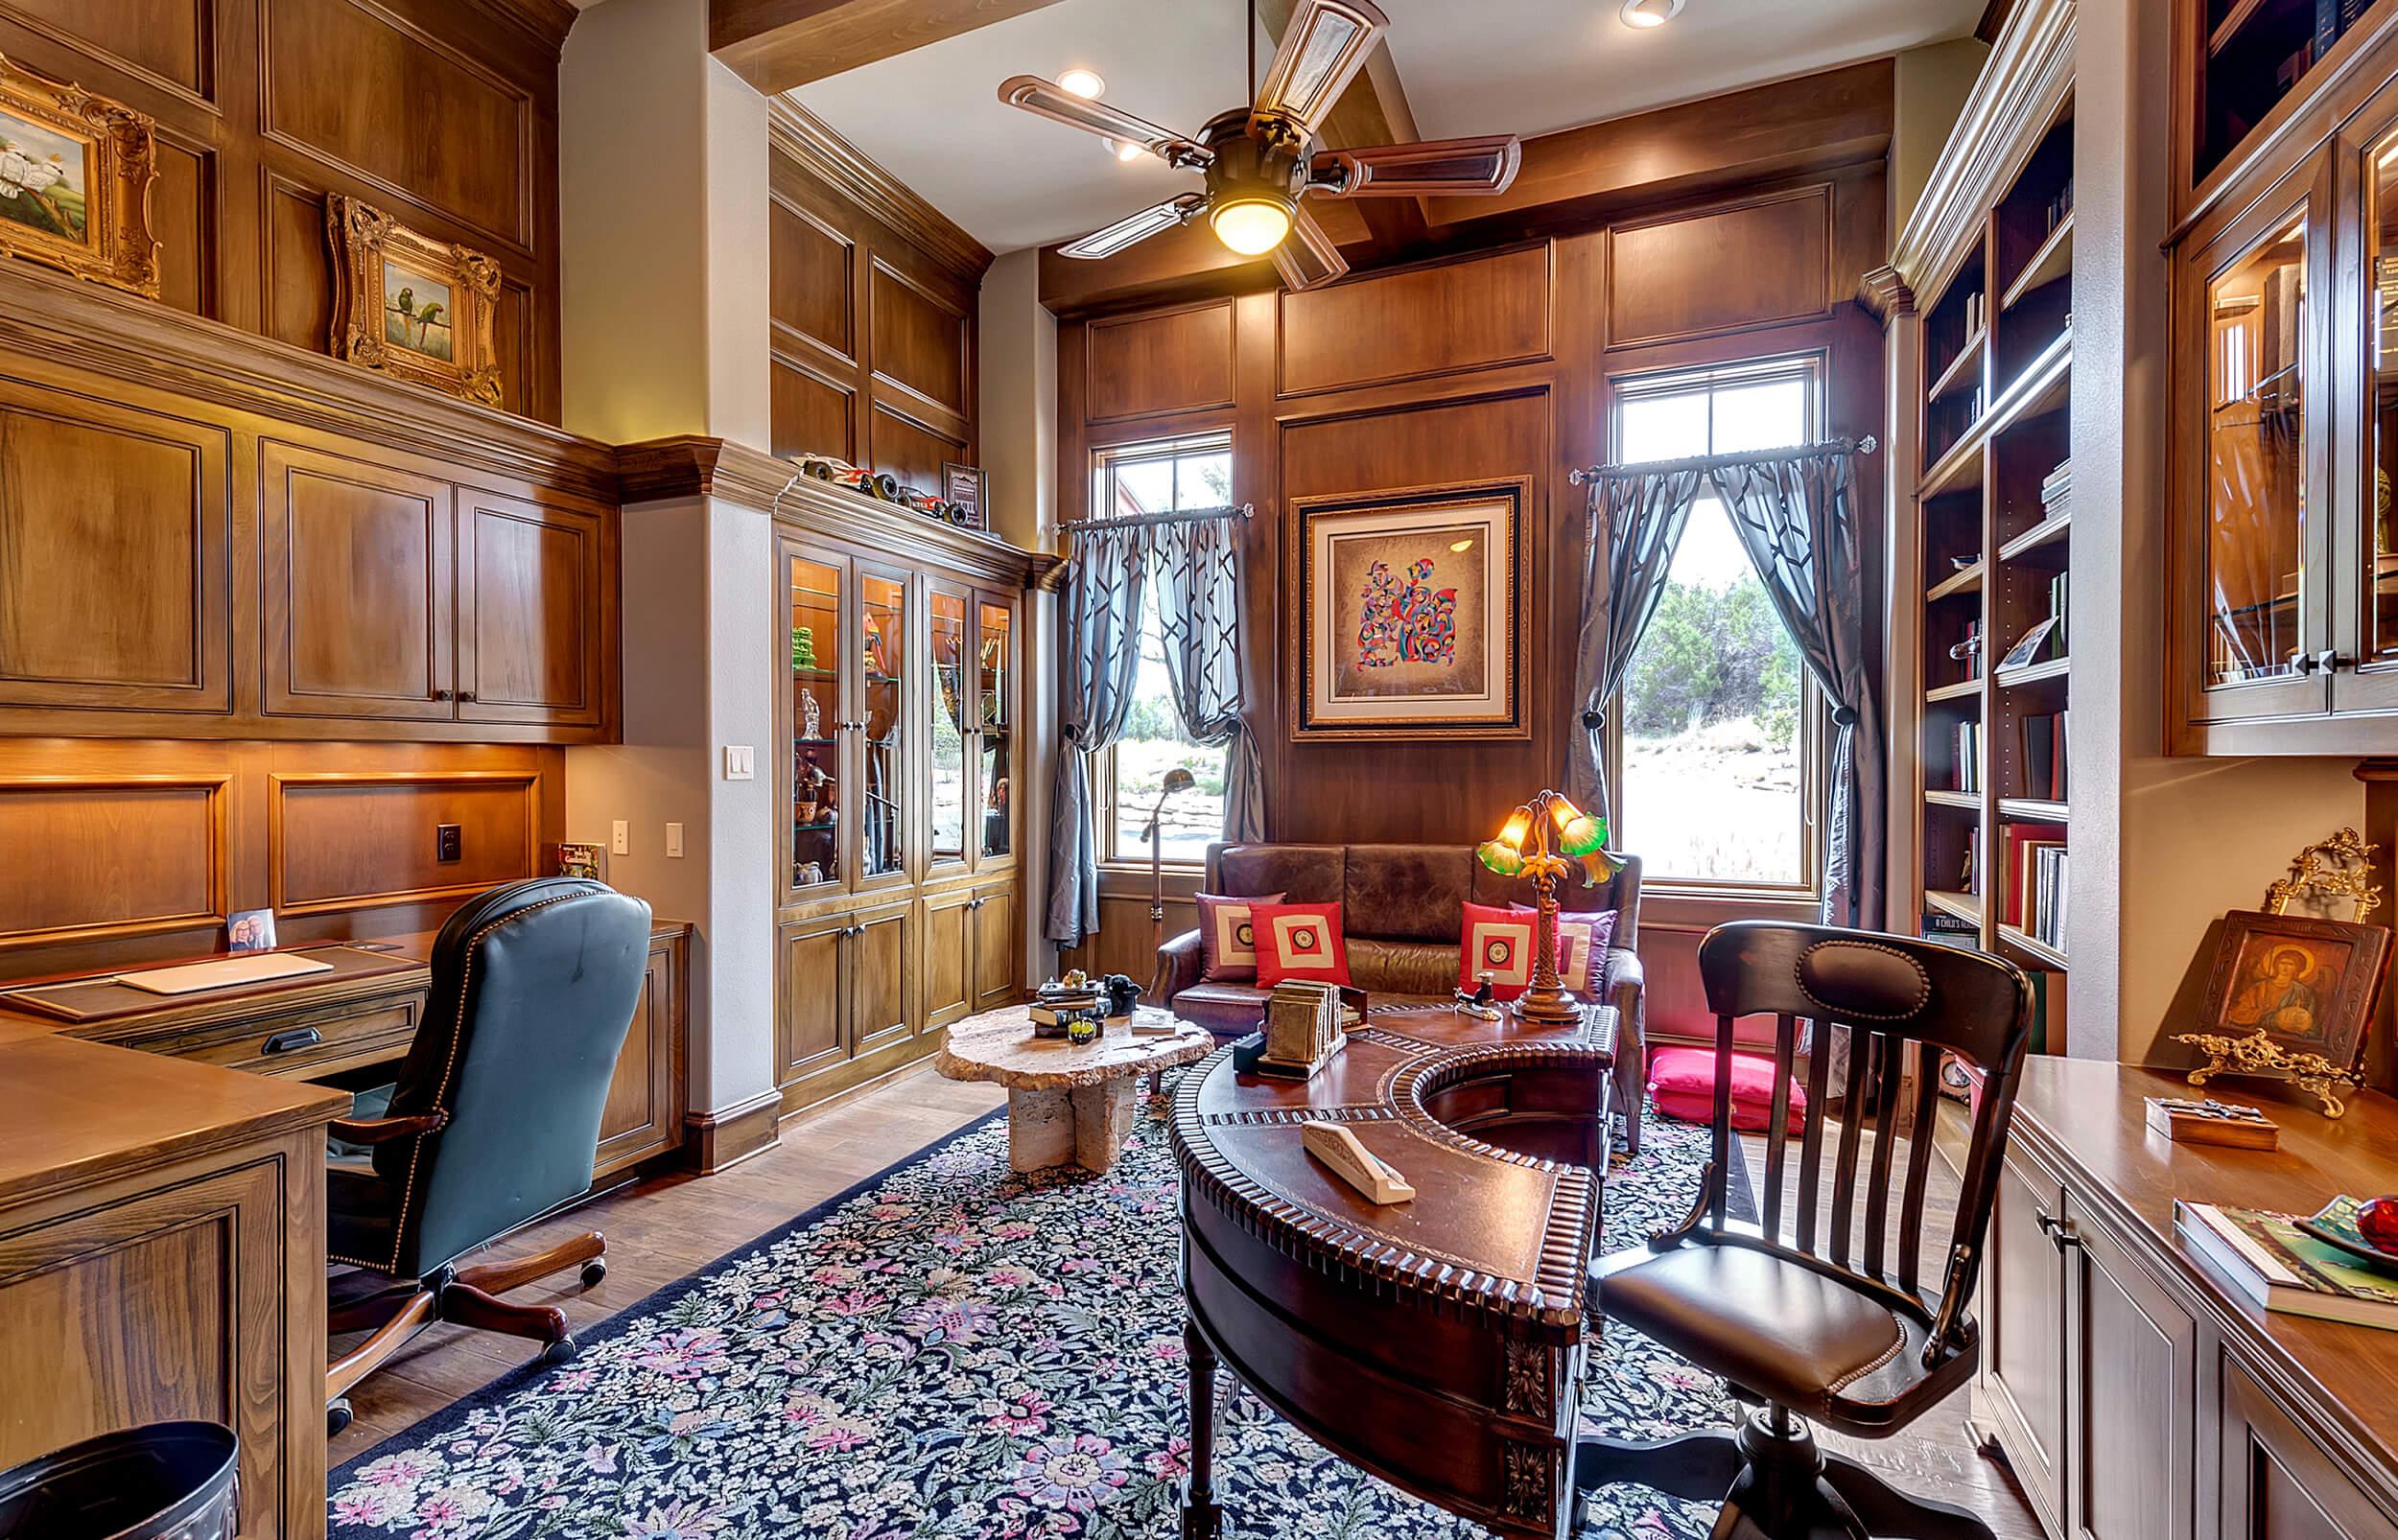 Steve Bumpas Custom Homes Ridgeview 12 Homebuilder Remodel Granbury Brazos Bend Cresson DeCordova Pecan Plantation Tolar Glen Rose Fort Worth.jpg